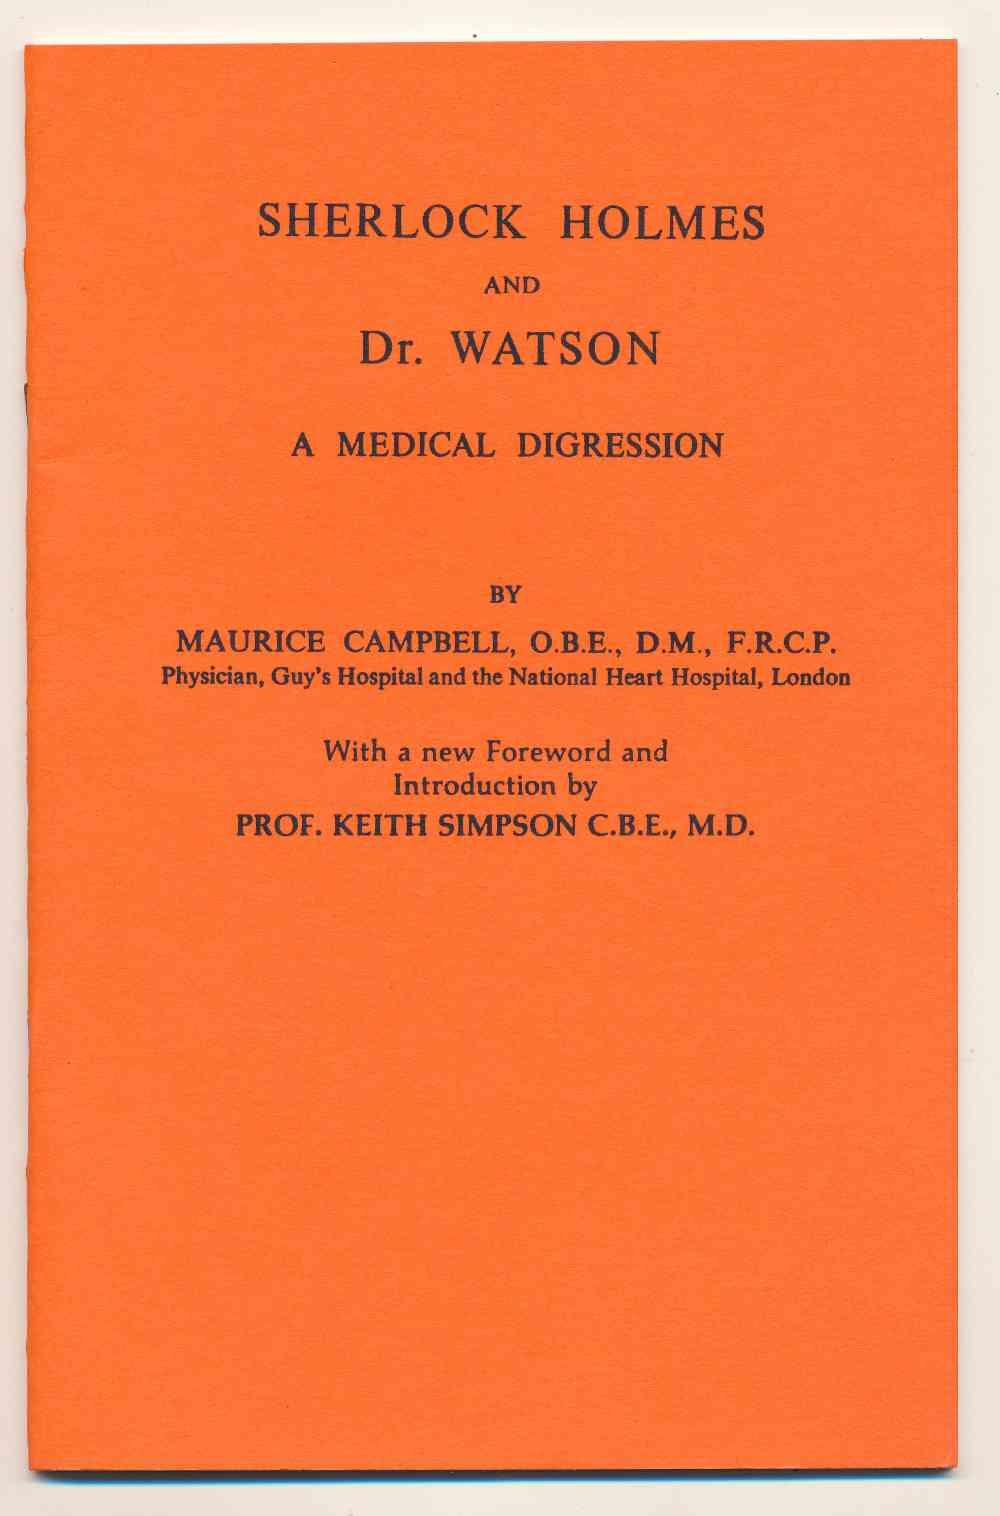 Sherlock Holmes and Dr. Watson : a medical digression